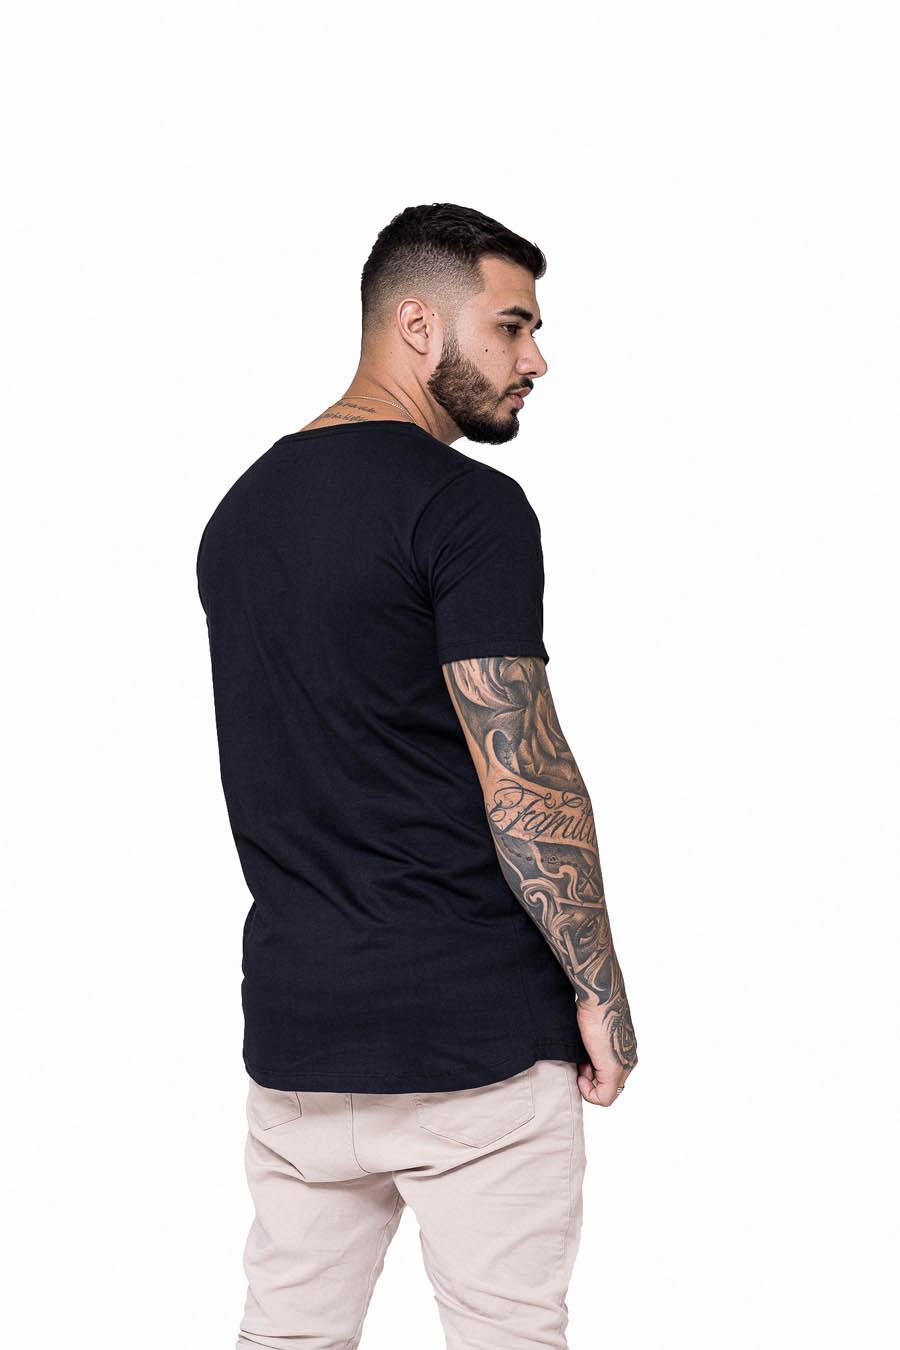 Camiseta Longline Preta Wall Old BT